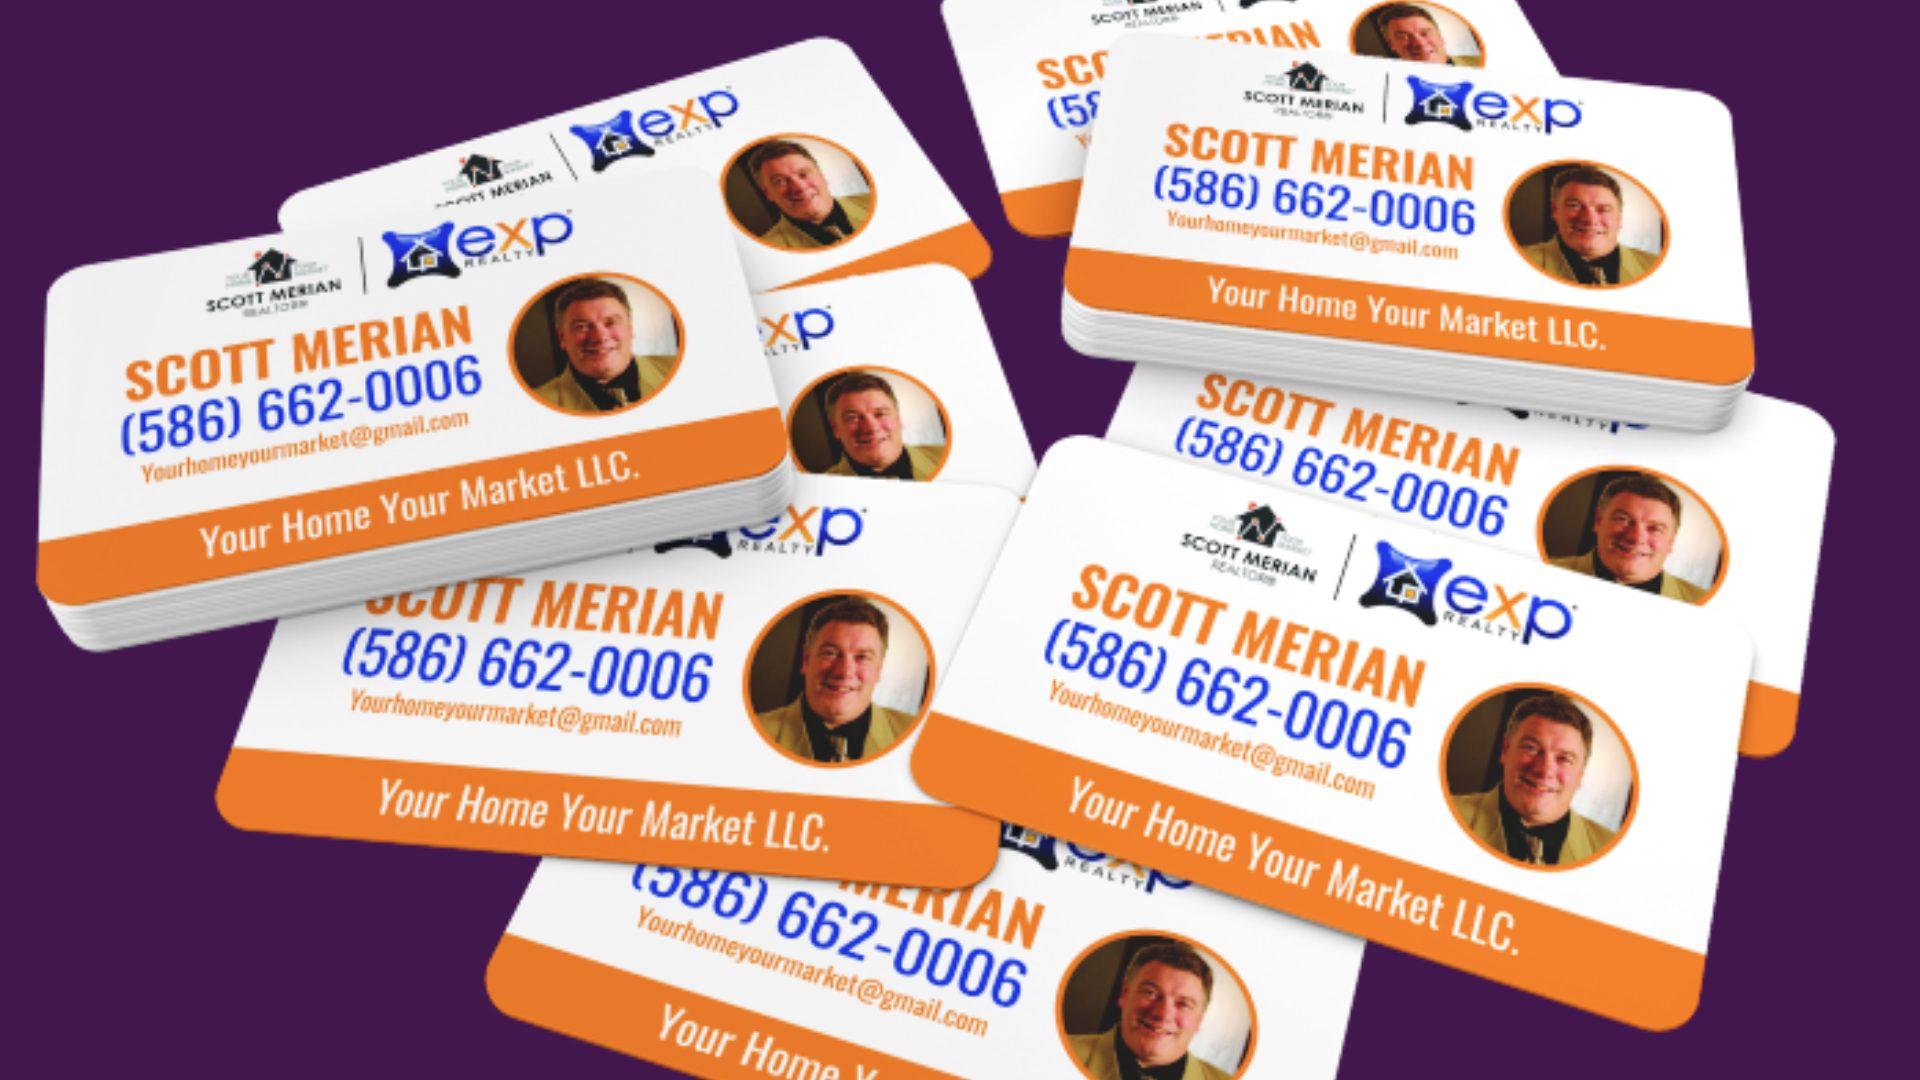 Your Home Your Market LLC - Scott Merian's Cards (3)